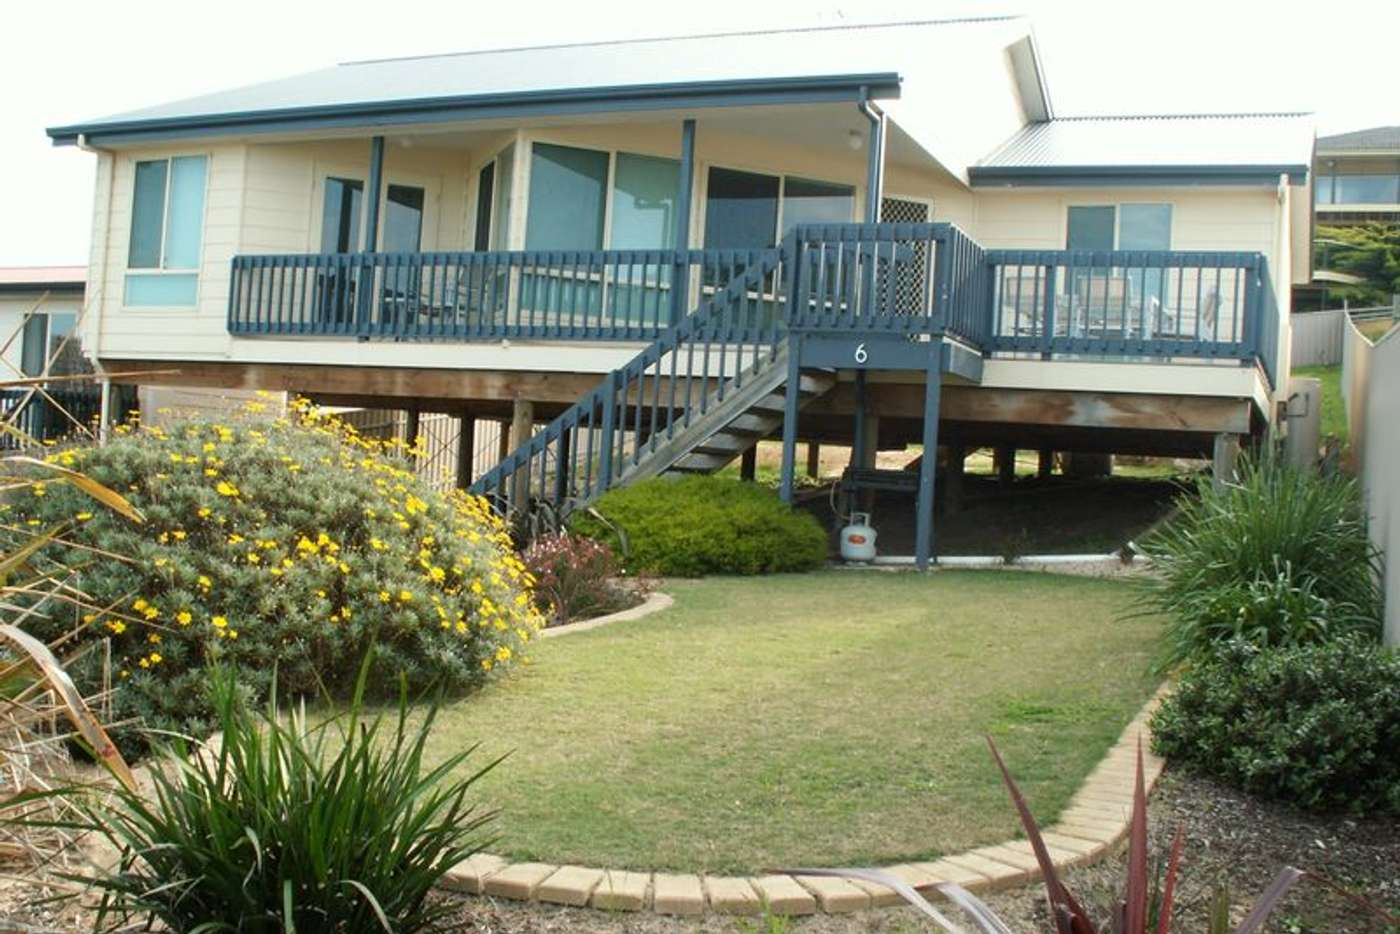 Main view of Homely house listing, 6 Pilot Crt, Encounter Bay SA 5211